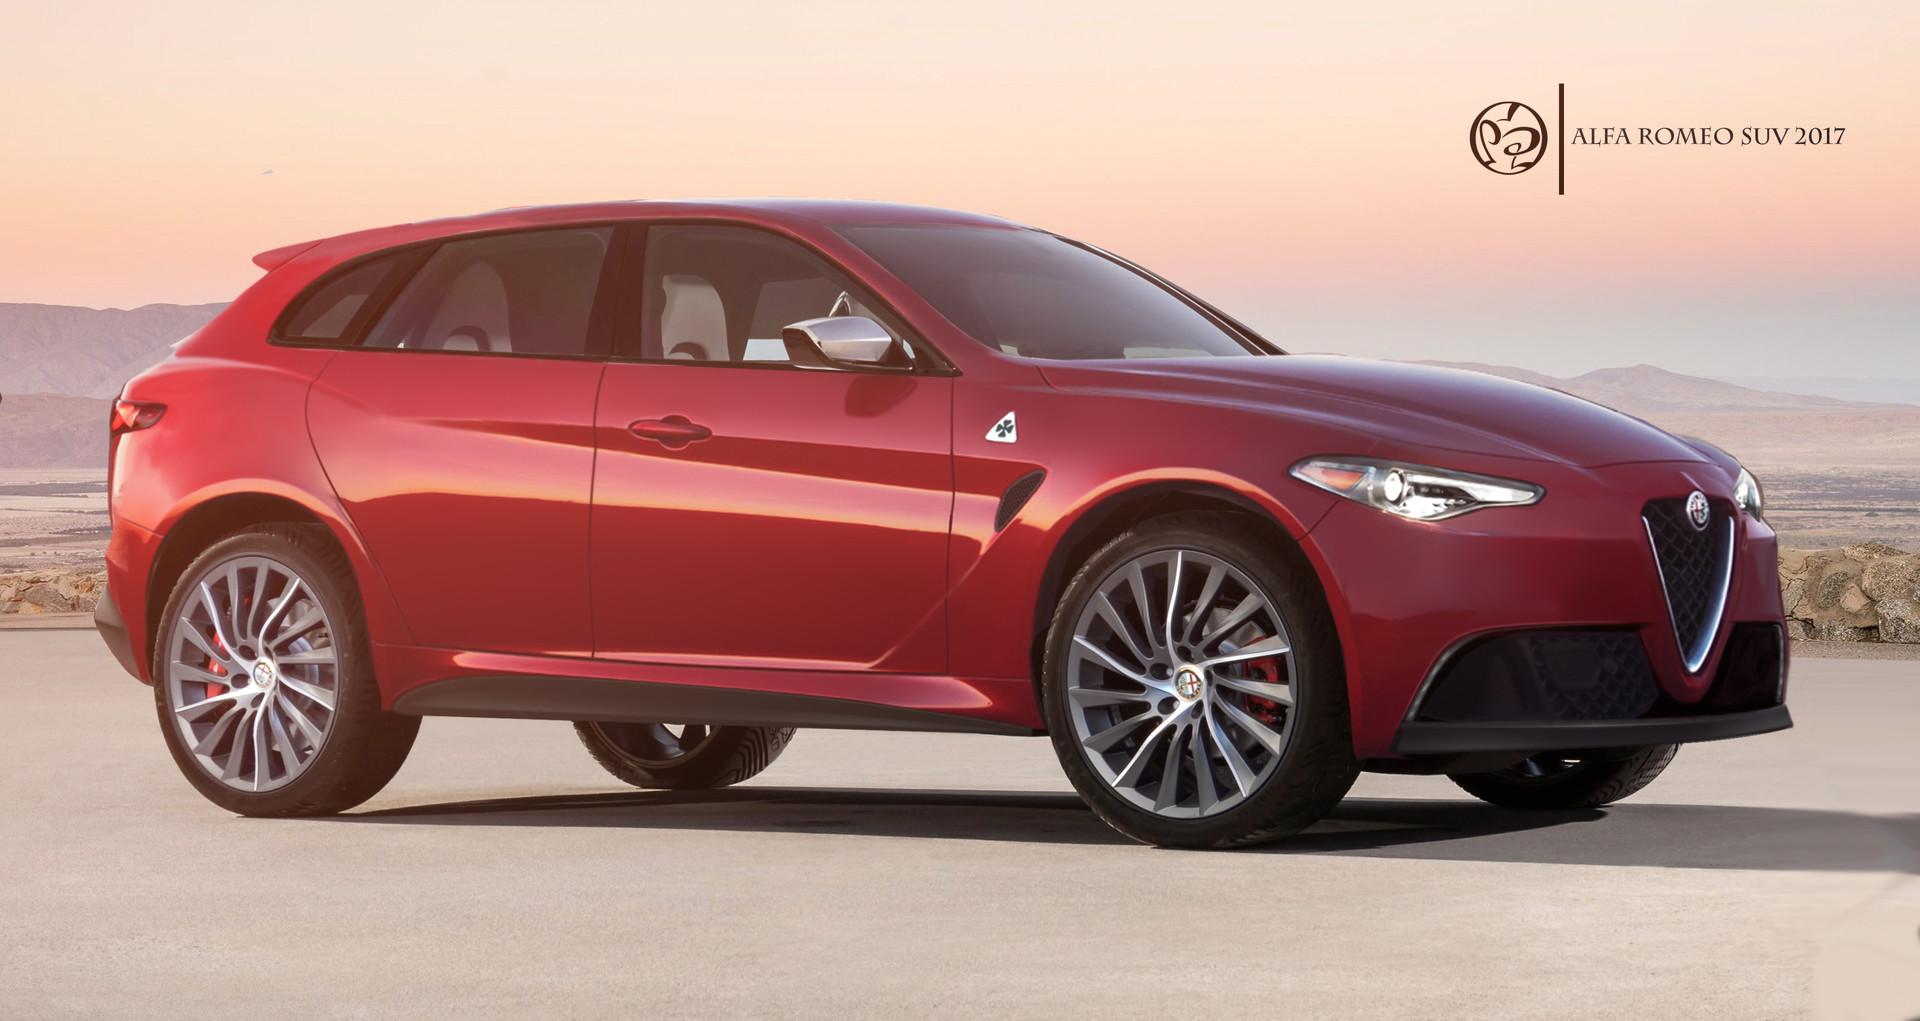 Psa Rt Alfa Romeo Suv 2017